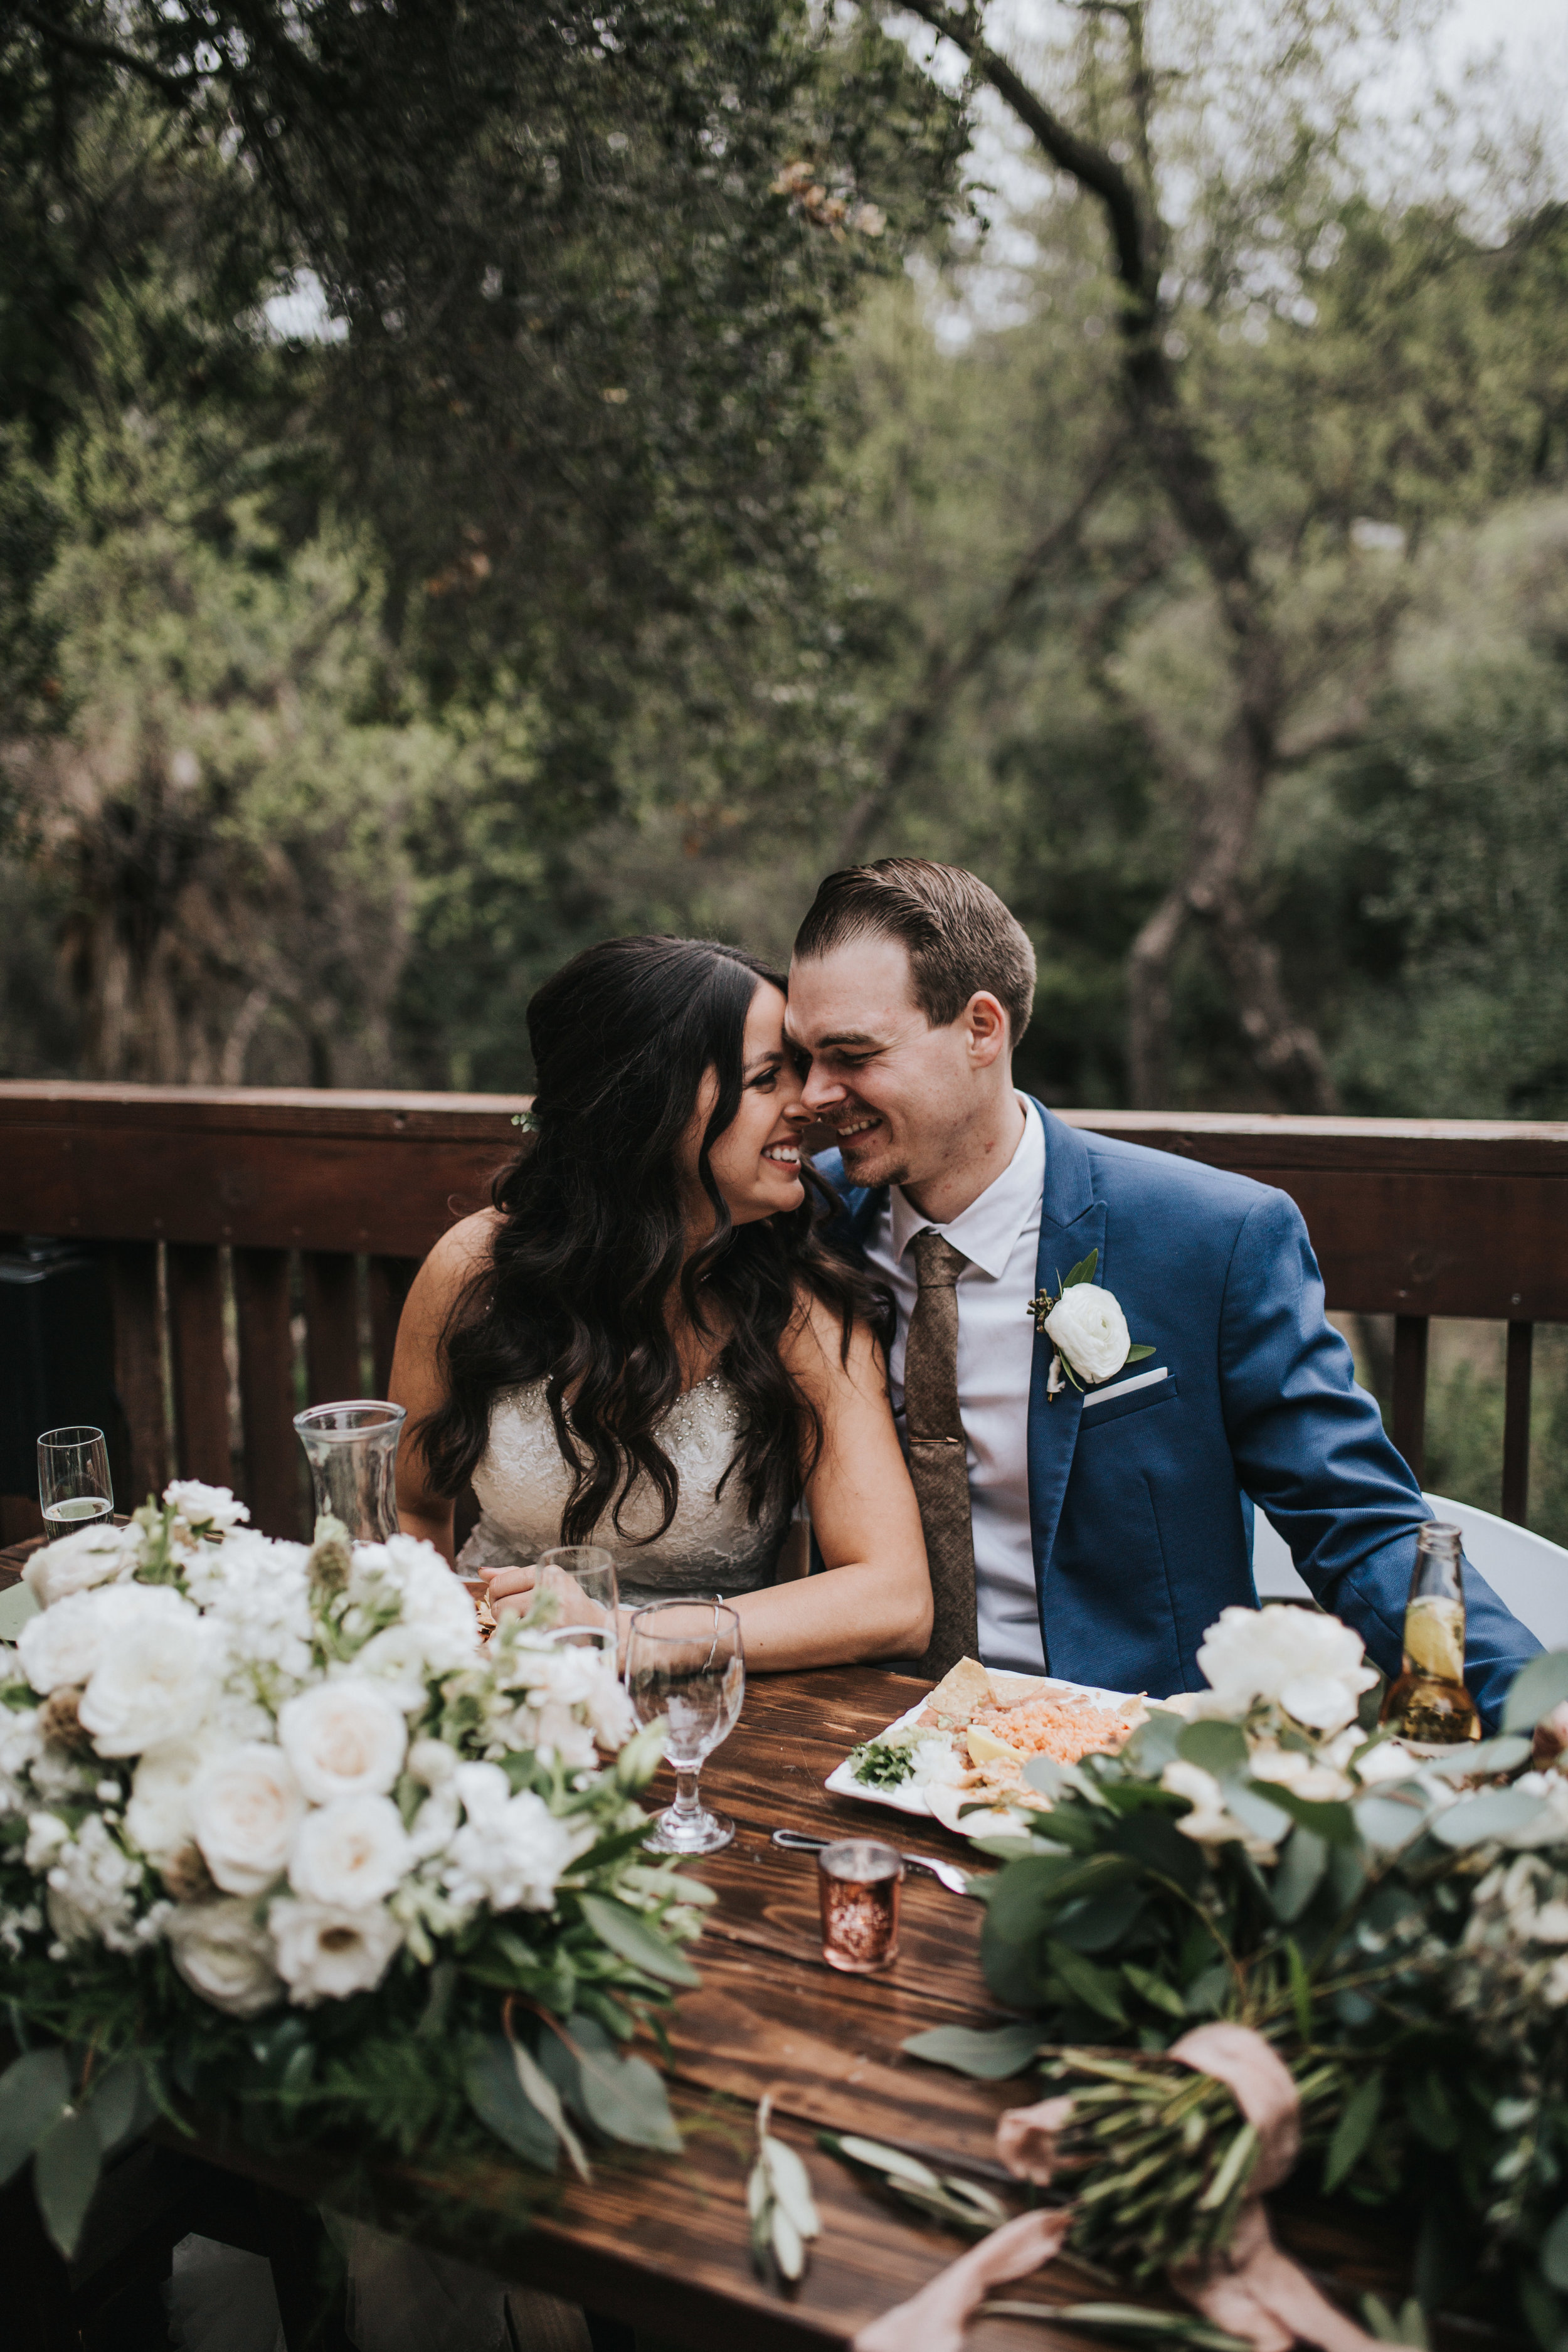 The 1909, The 1909 Wedding, Topanga Canyon Wedding, sweetheart table ideas, sweetheart table arrangement, candid wedding photos